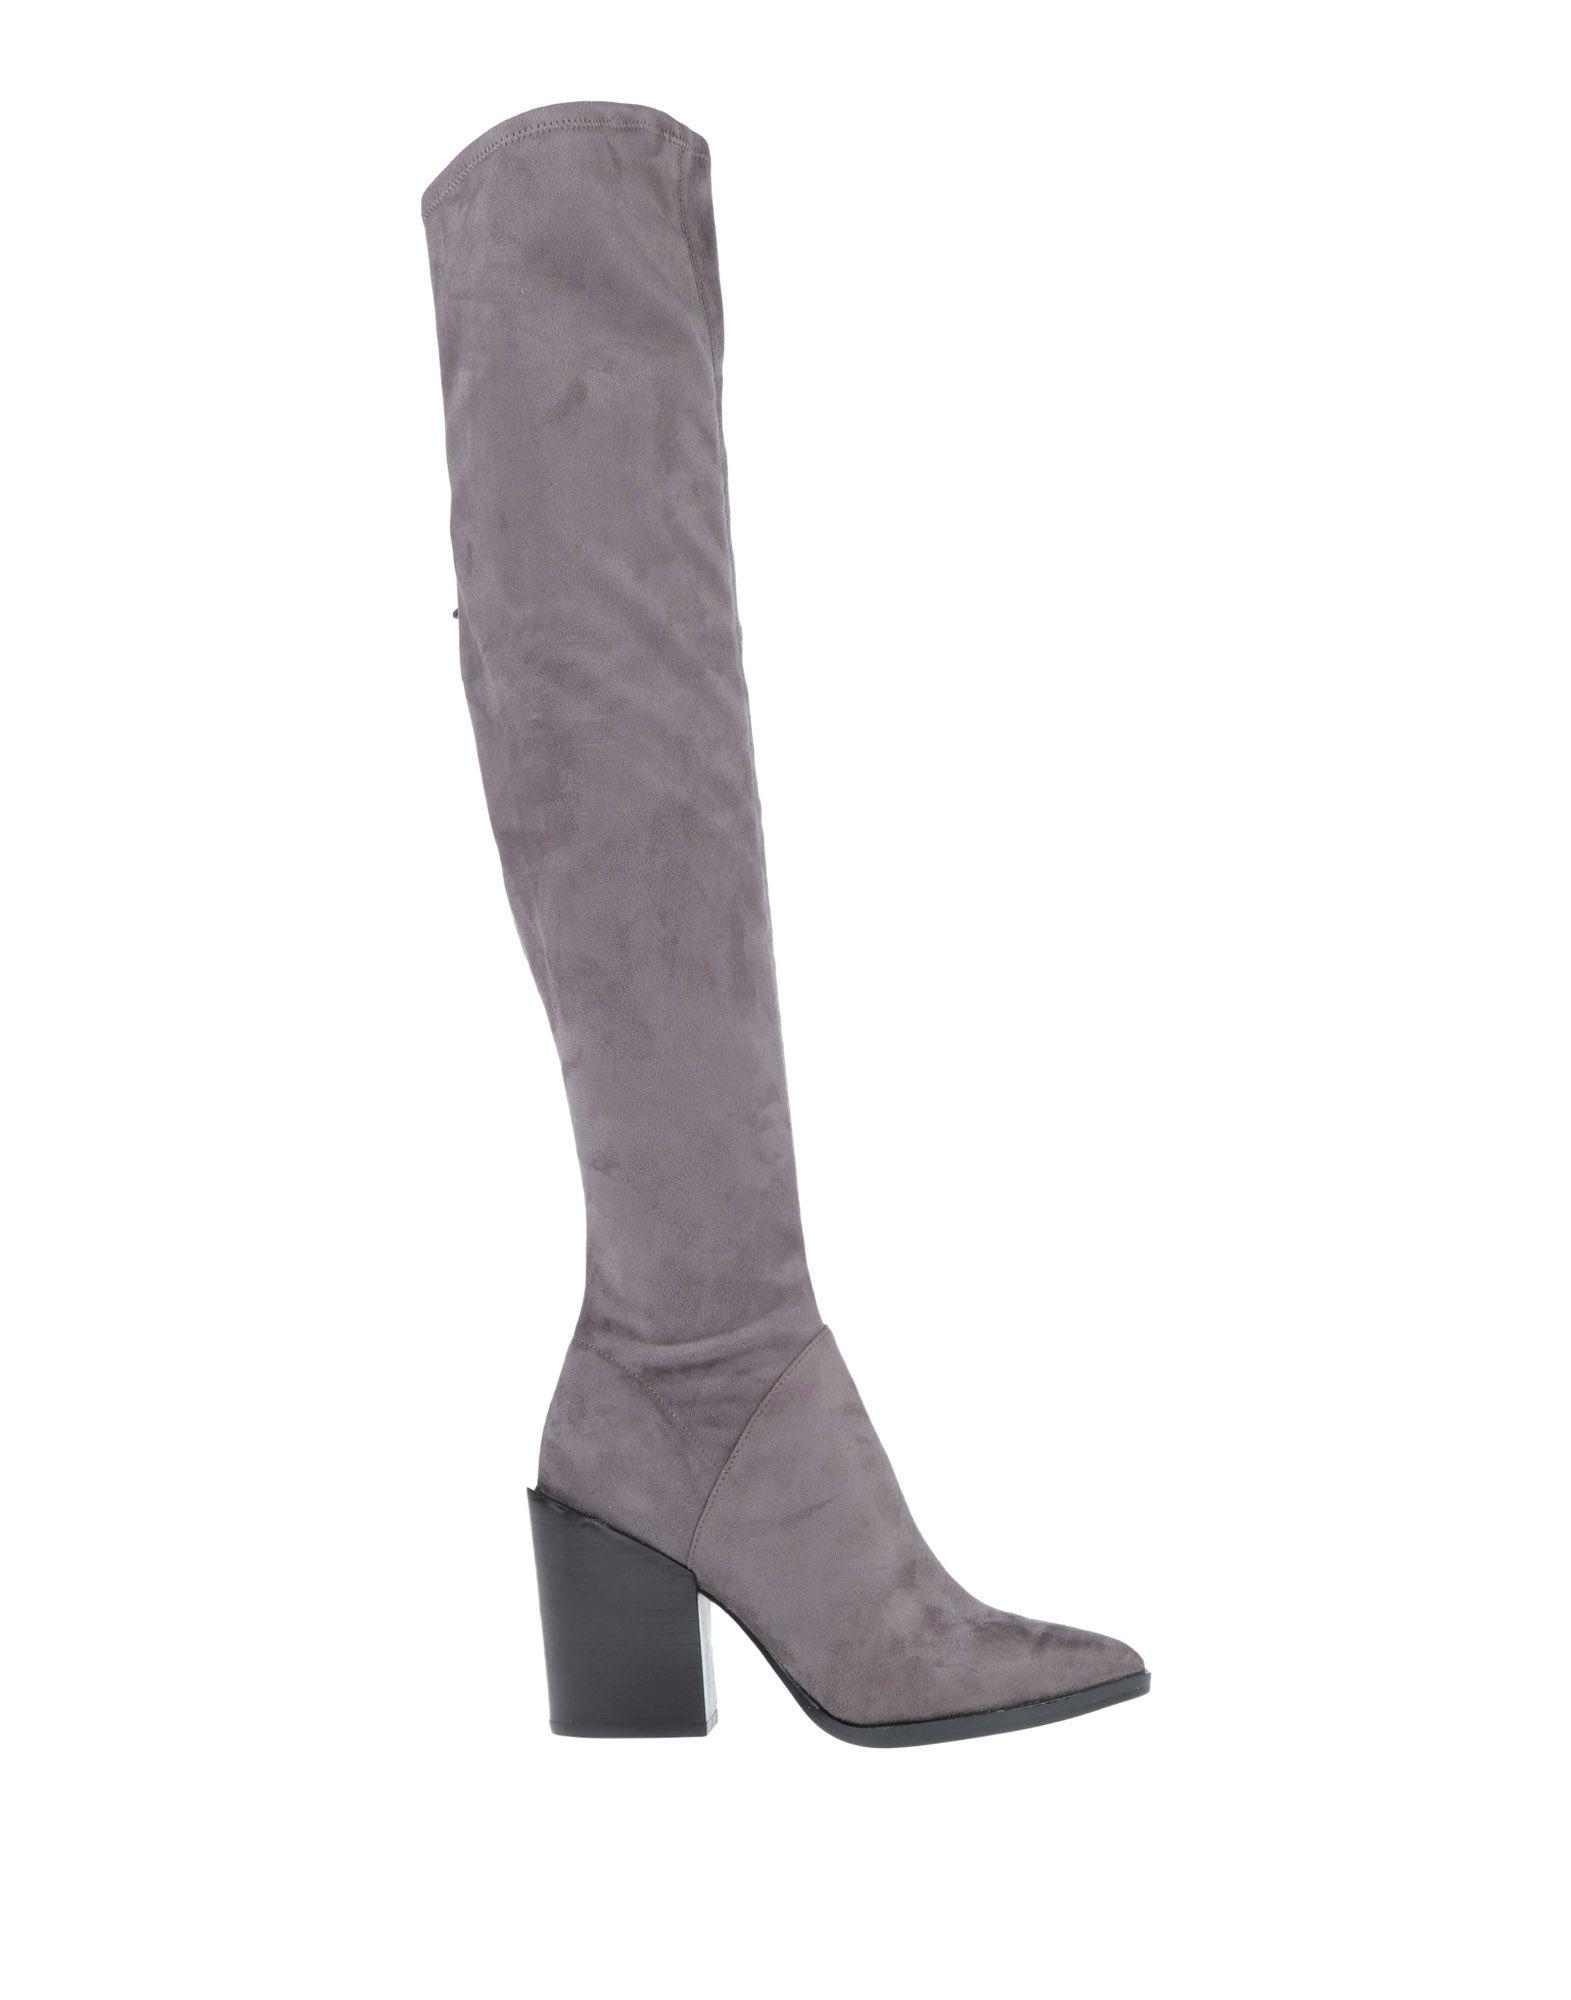 Kendall + Kylie Stiefel Damen  11219109PN Gute Qualität beliebte Schuhe